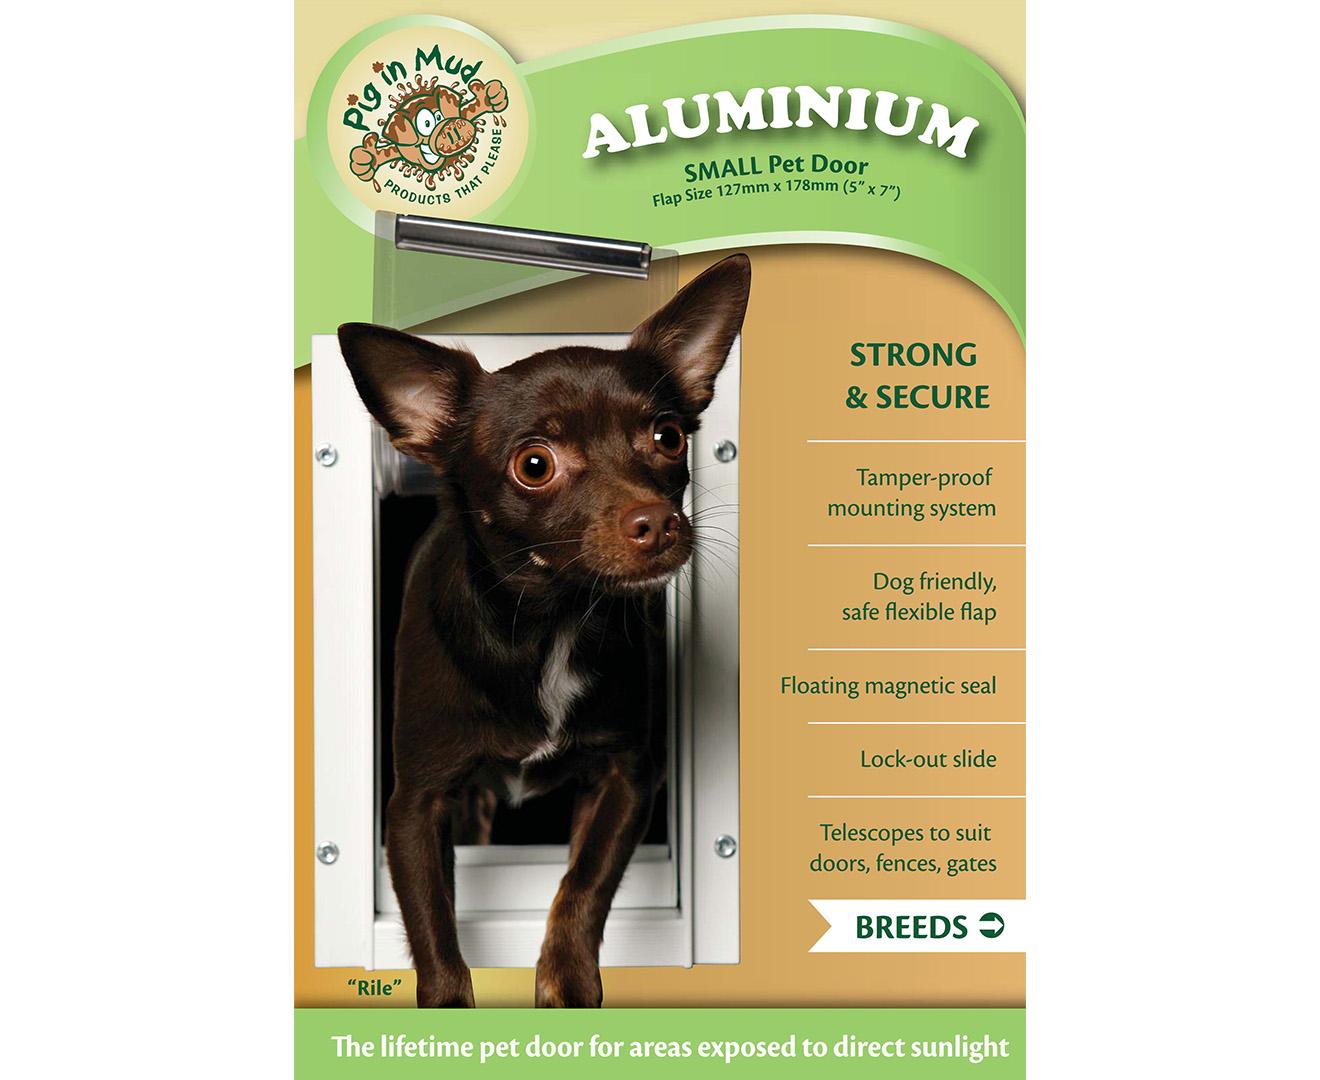 Pig In Mud Aluminium Small Pet Door White Groceryrun